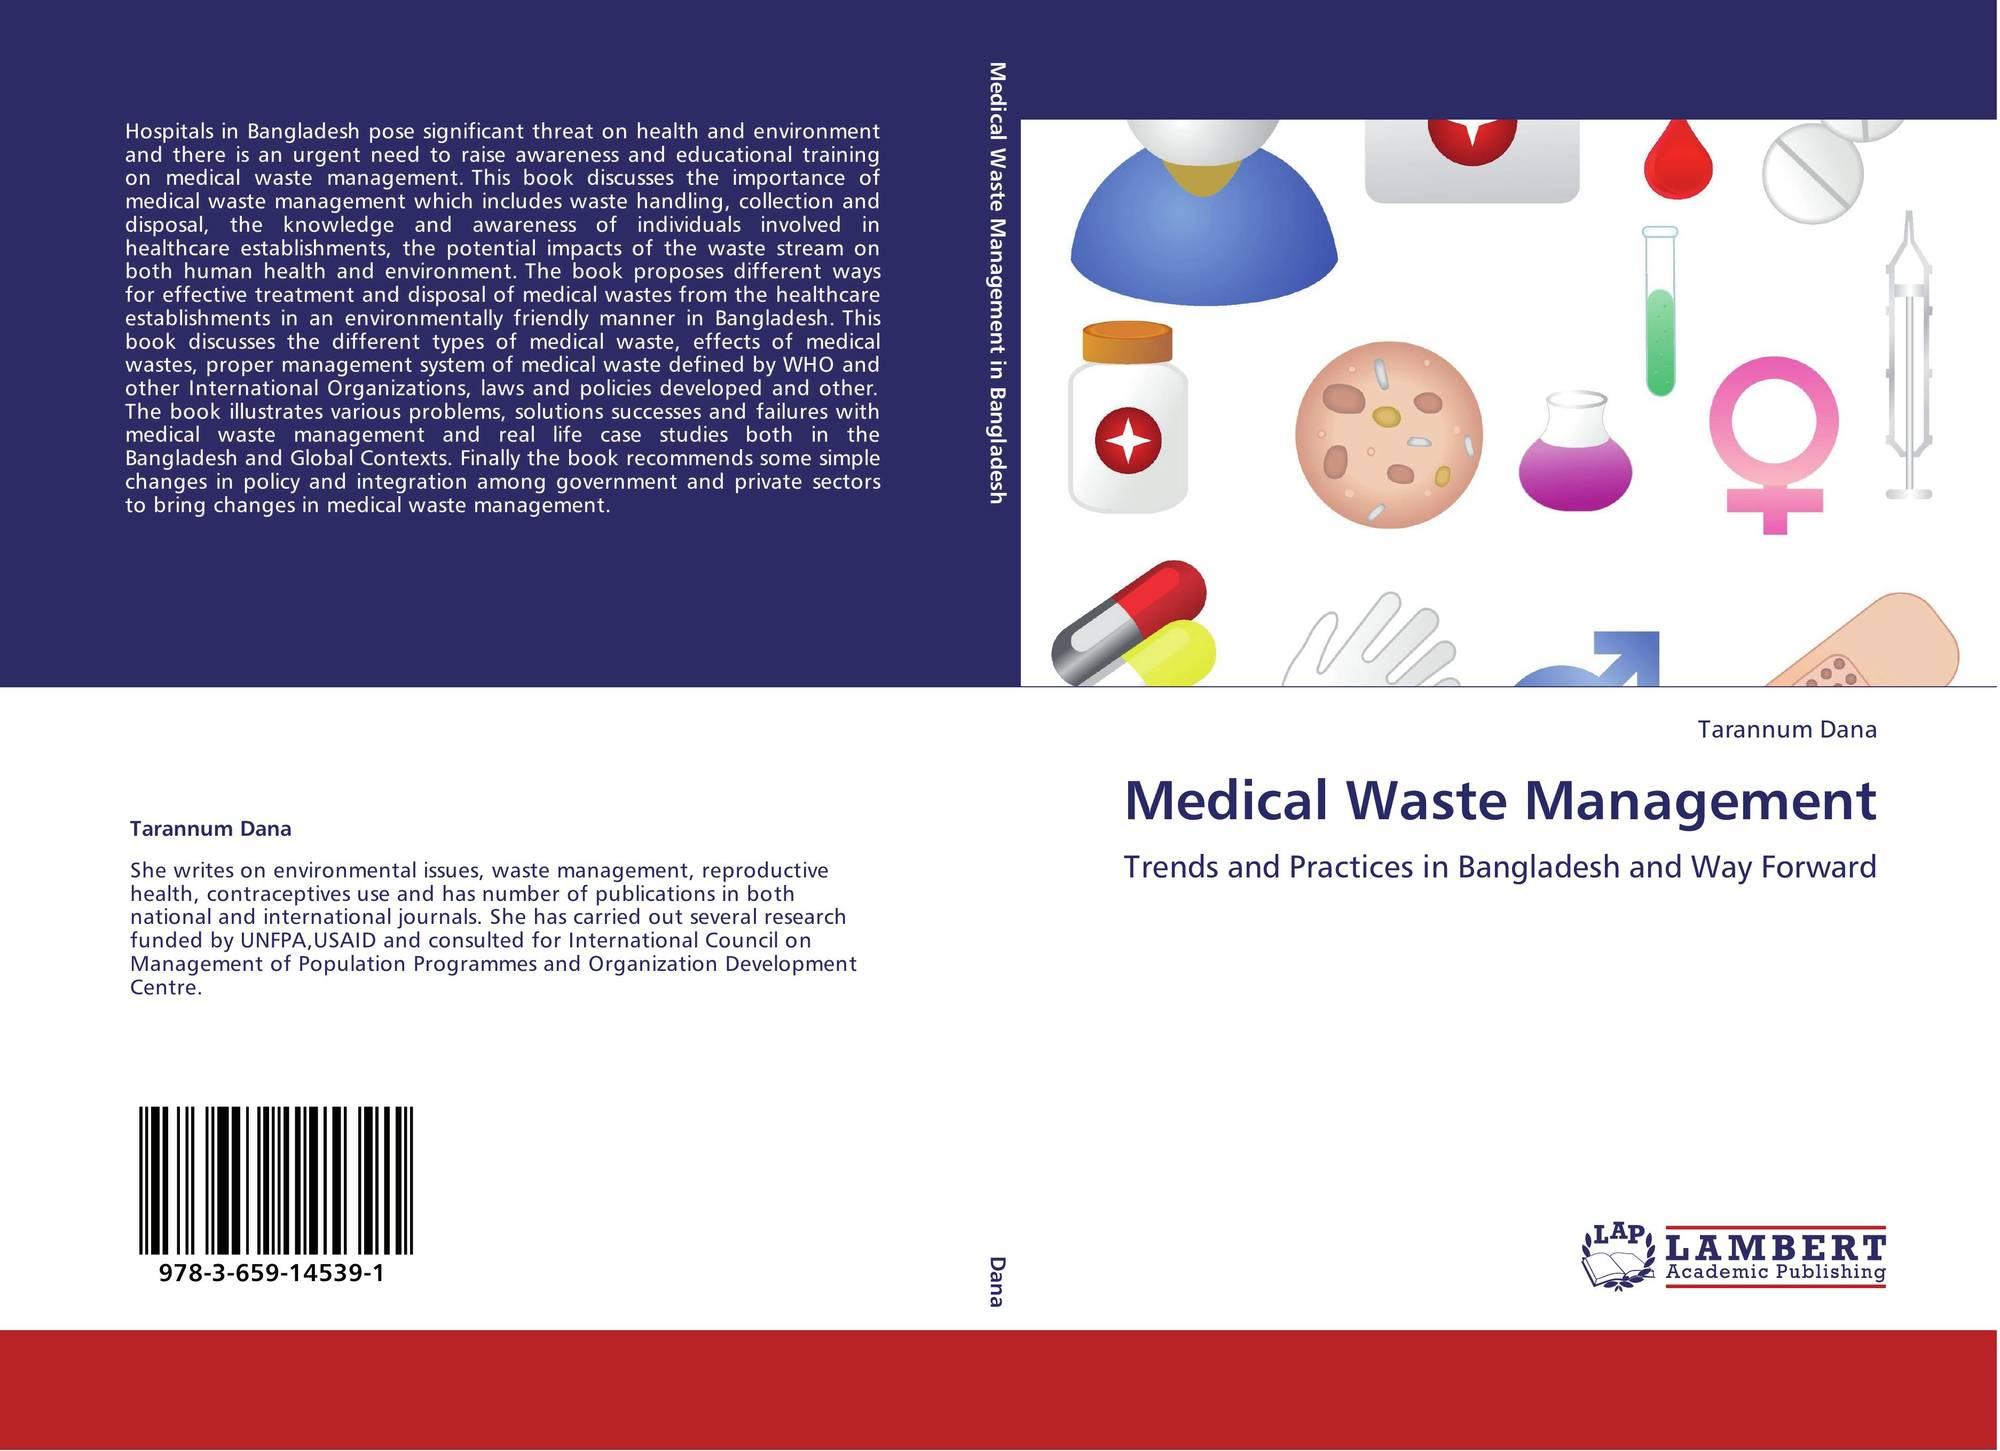 medical waste management Sample medical waste management plan  name of animal clinic or hospital  street address  city, state, zip  phone # medical waste management plan (a) types of waste generated.